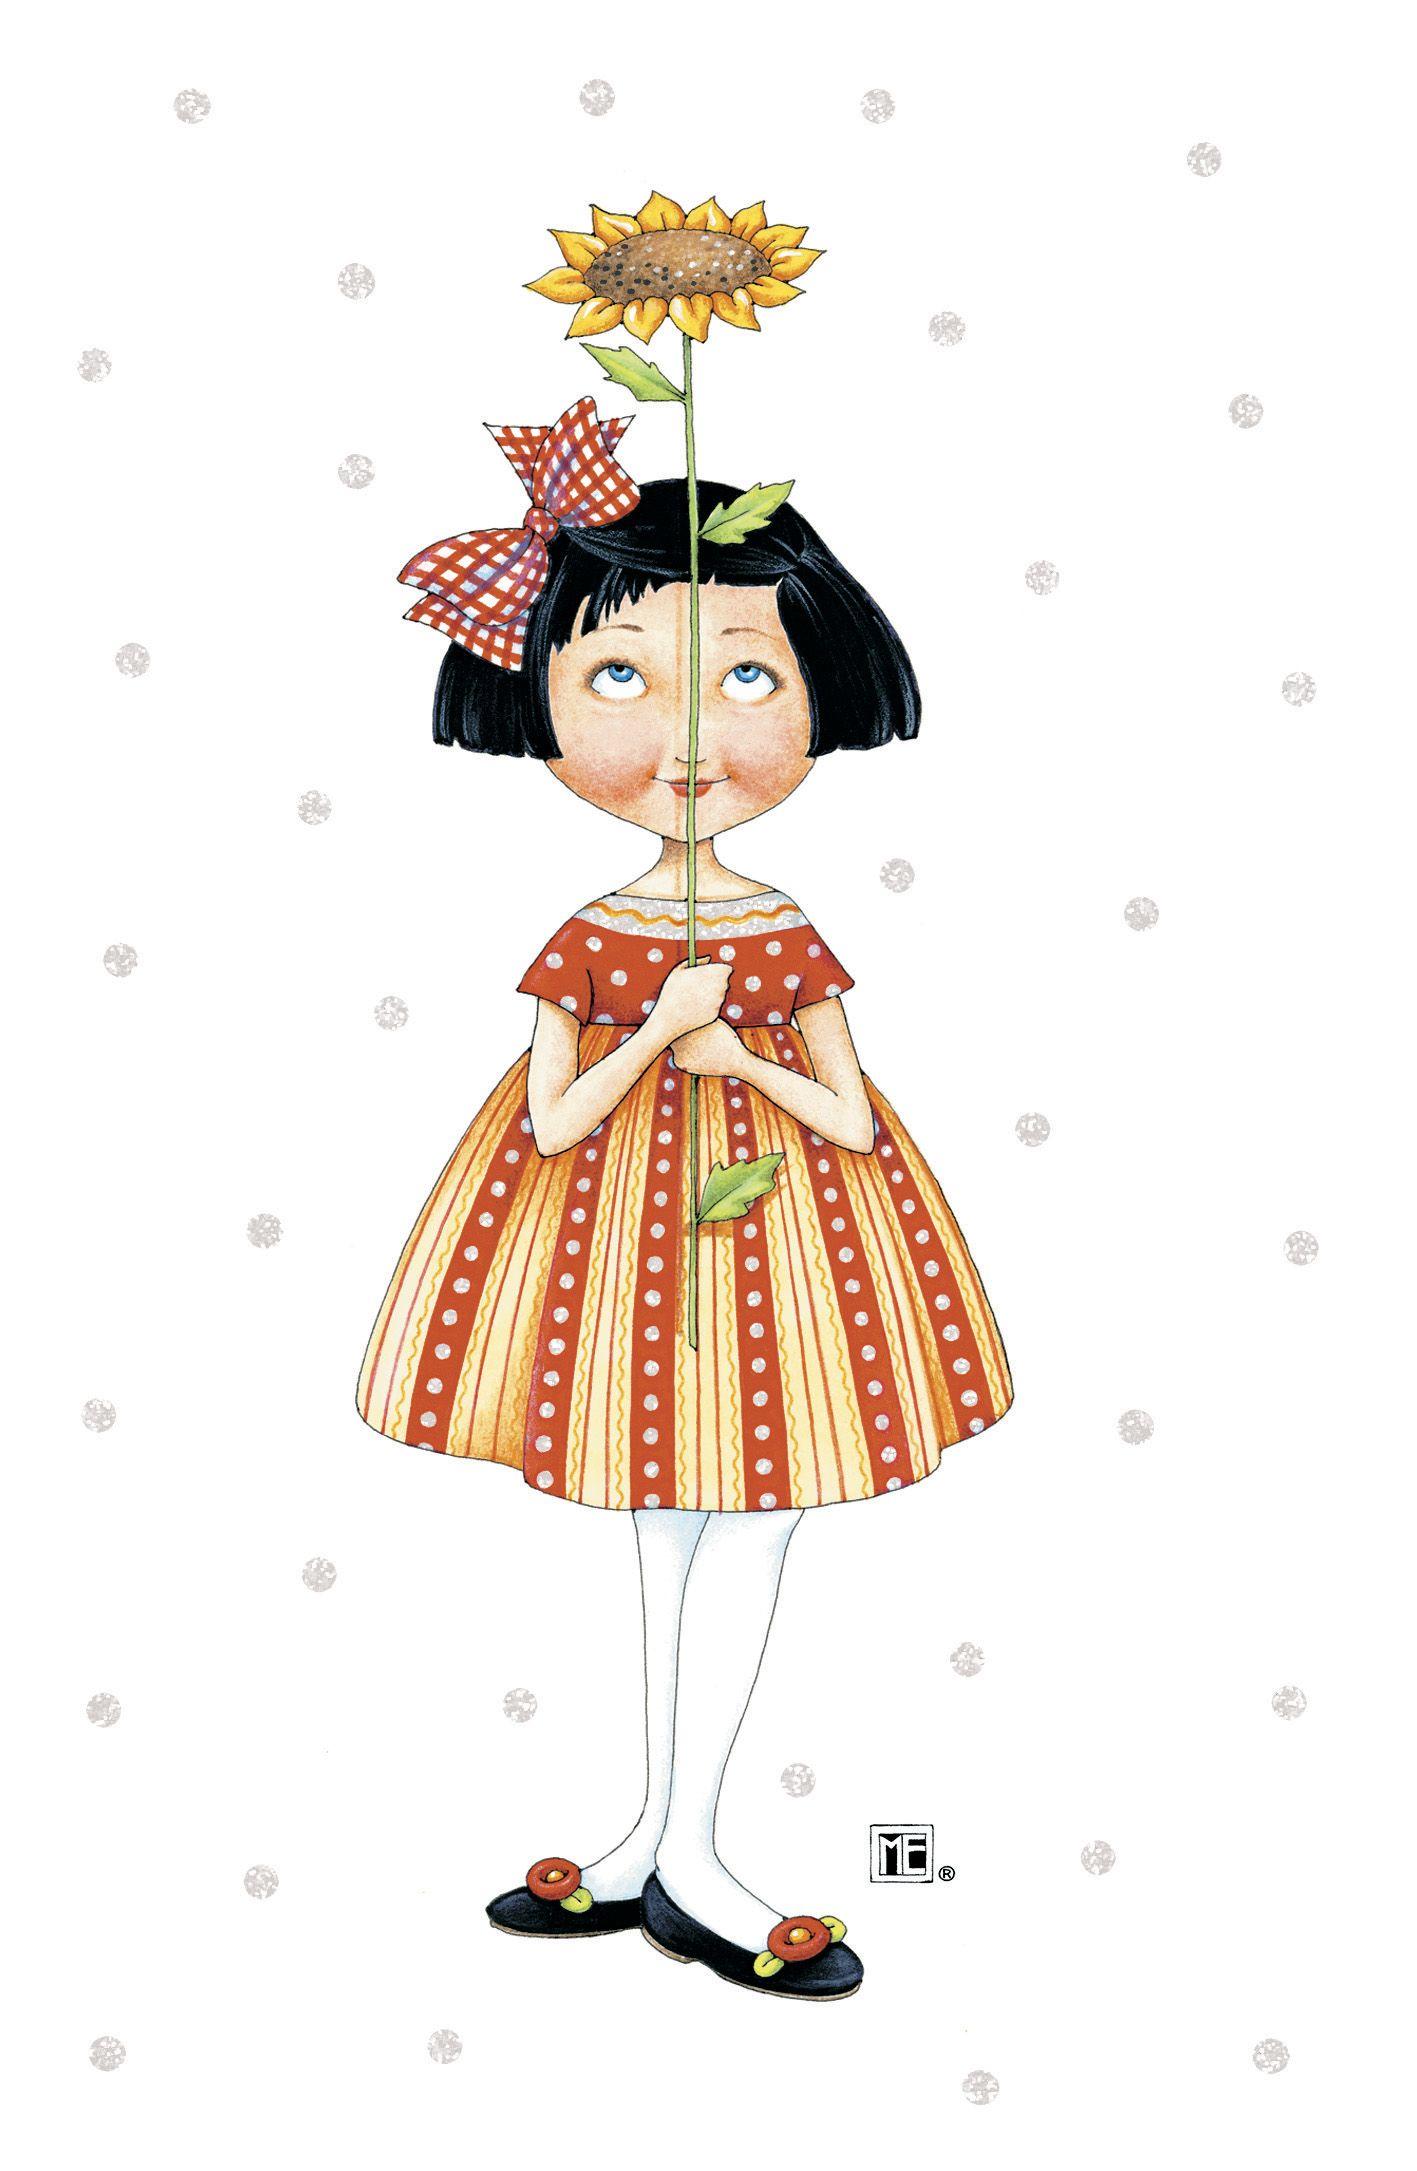 Happy birthday sunflower card by mary engelbreit